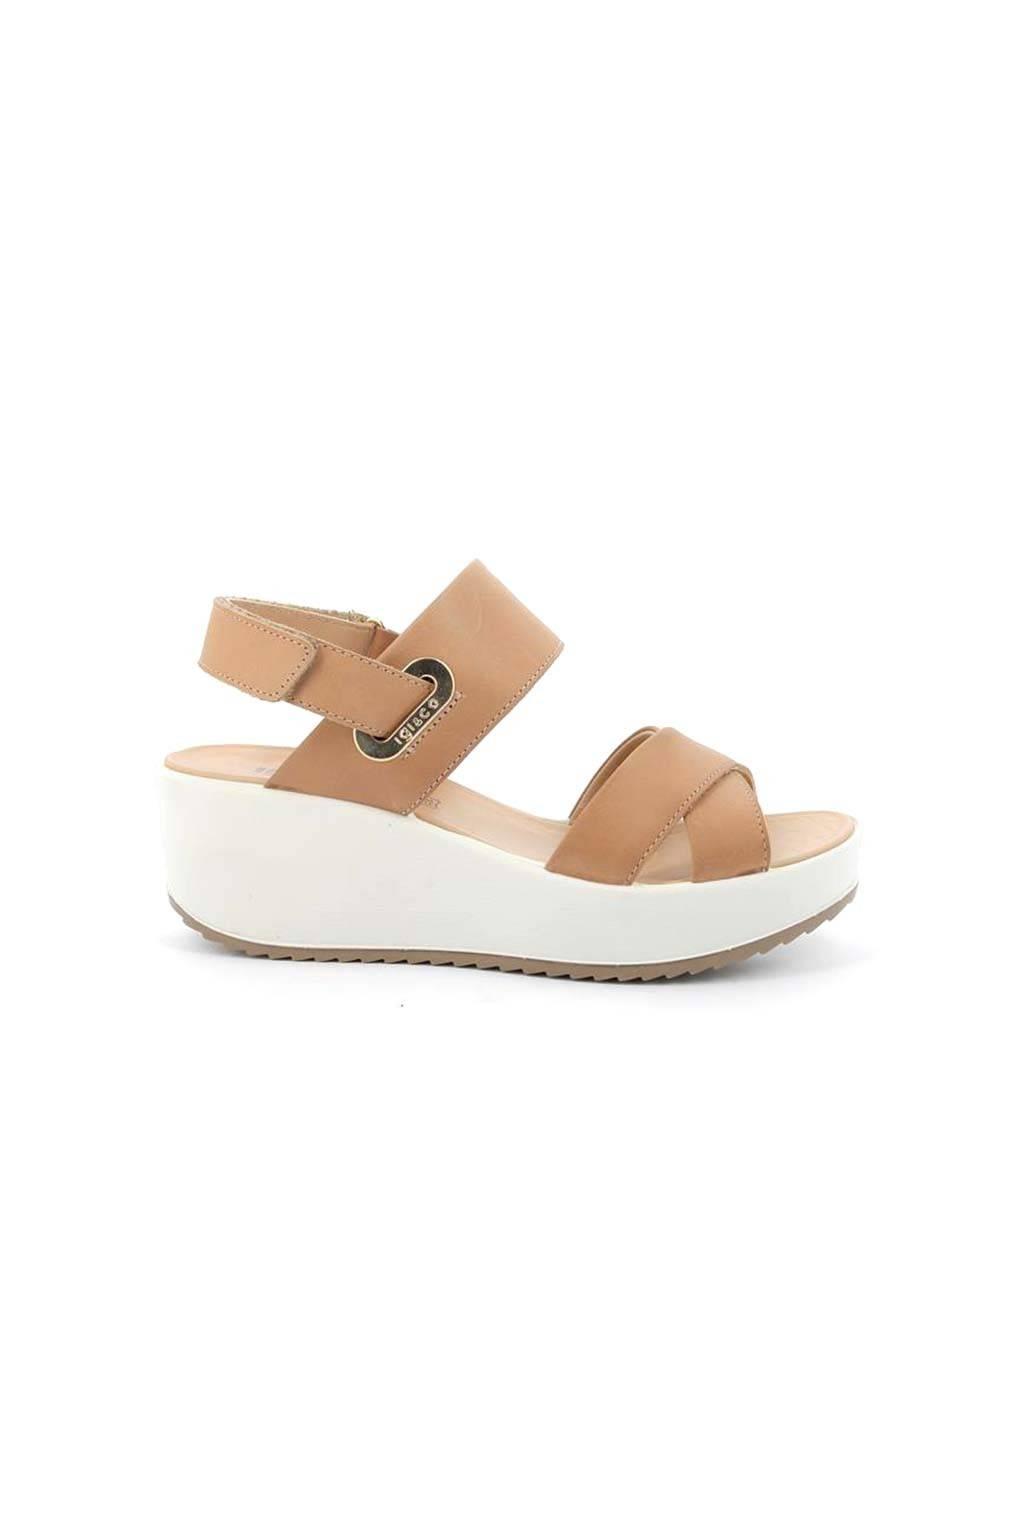 Sandalia Igi&Co  5178311 beige